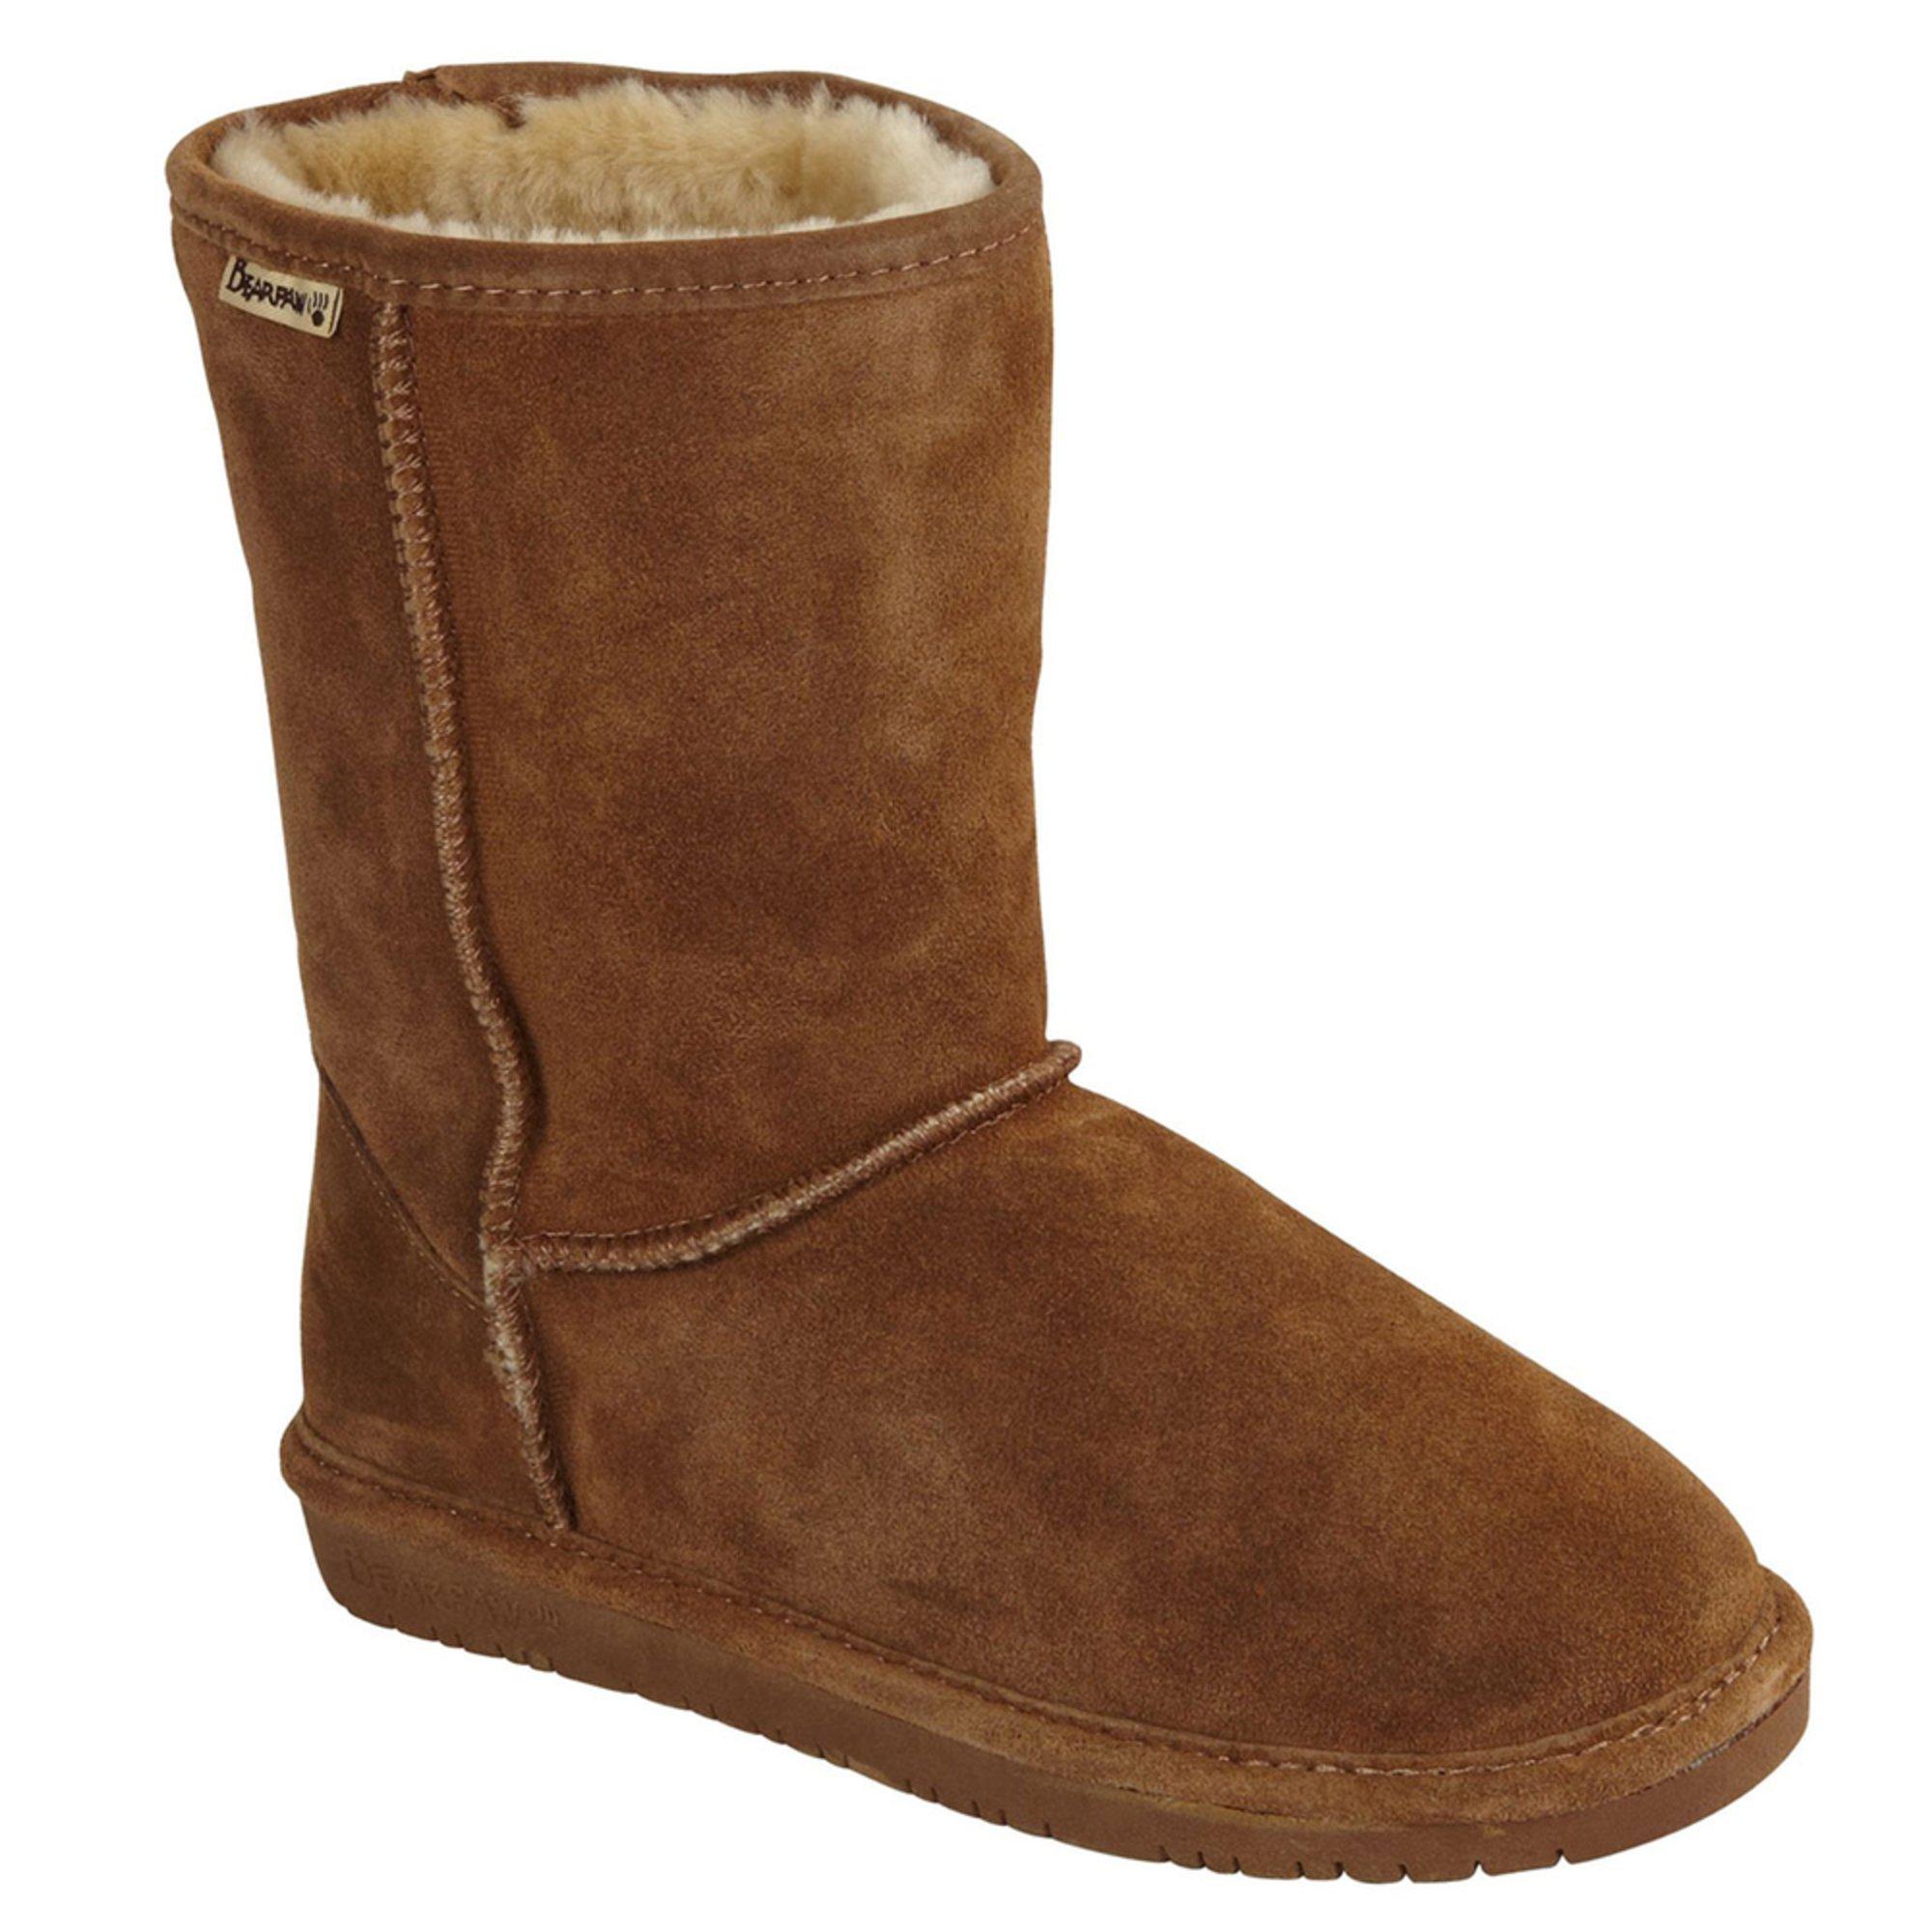 Bearpaw Shoes Sale